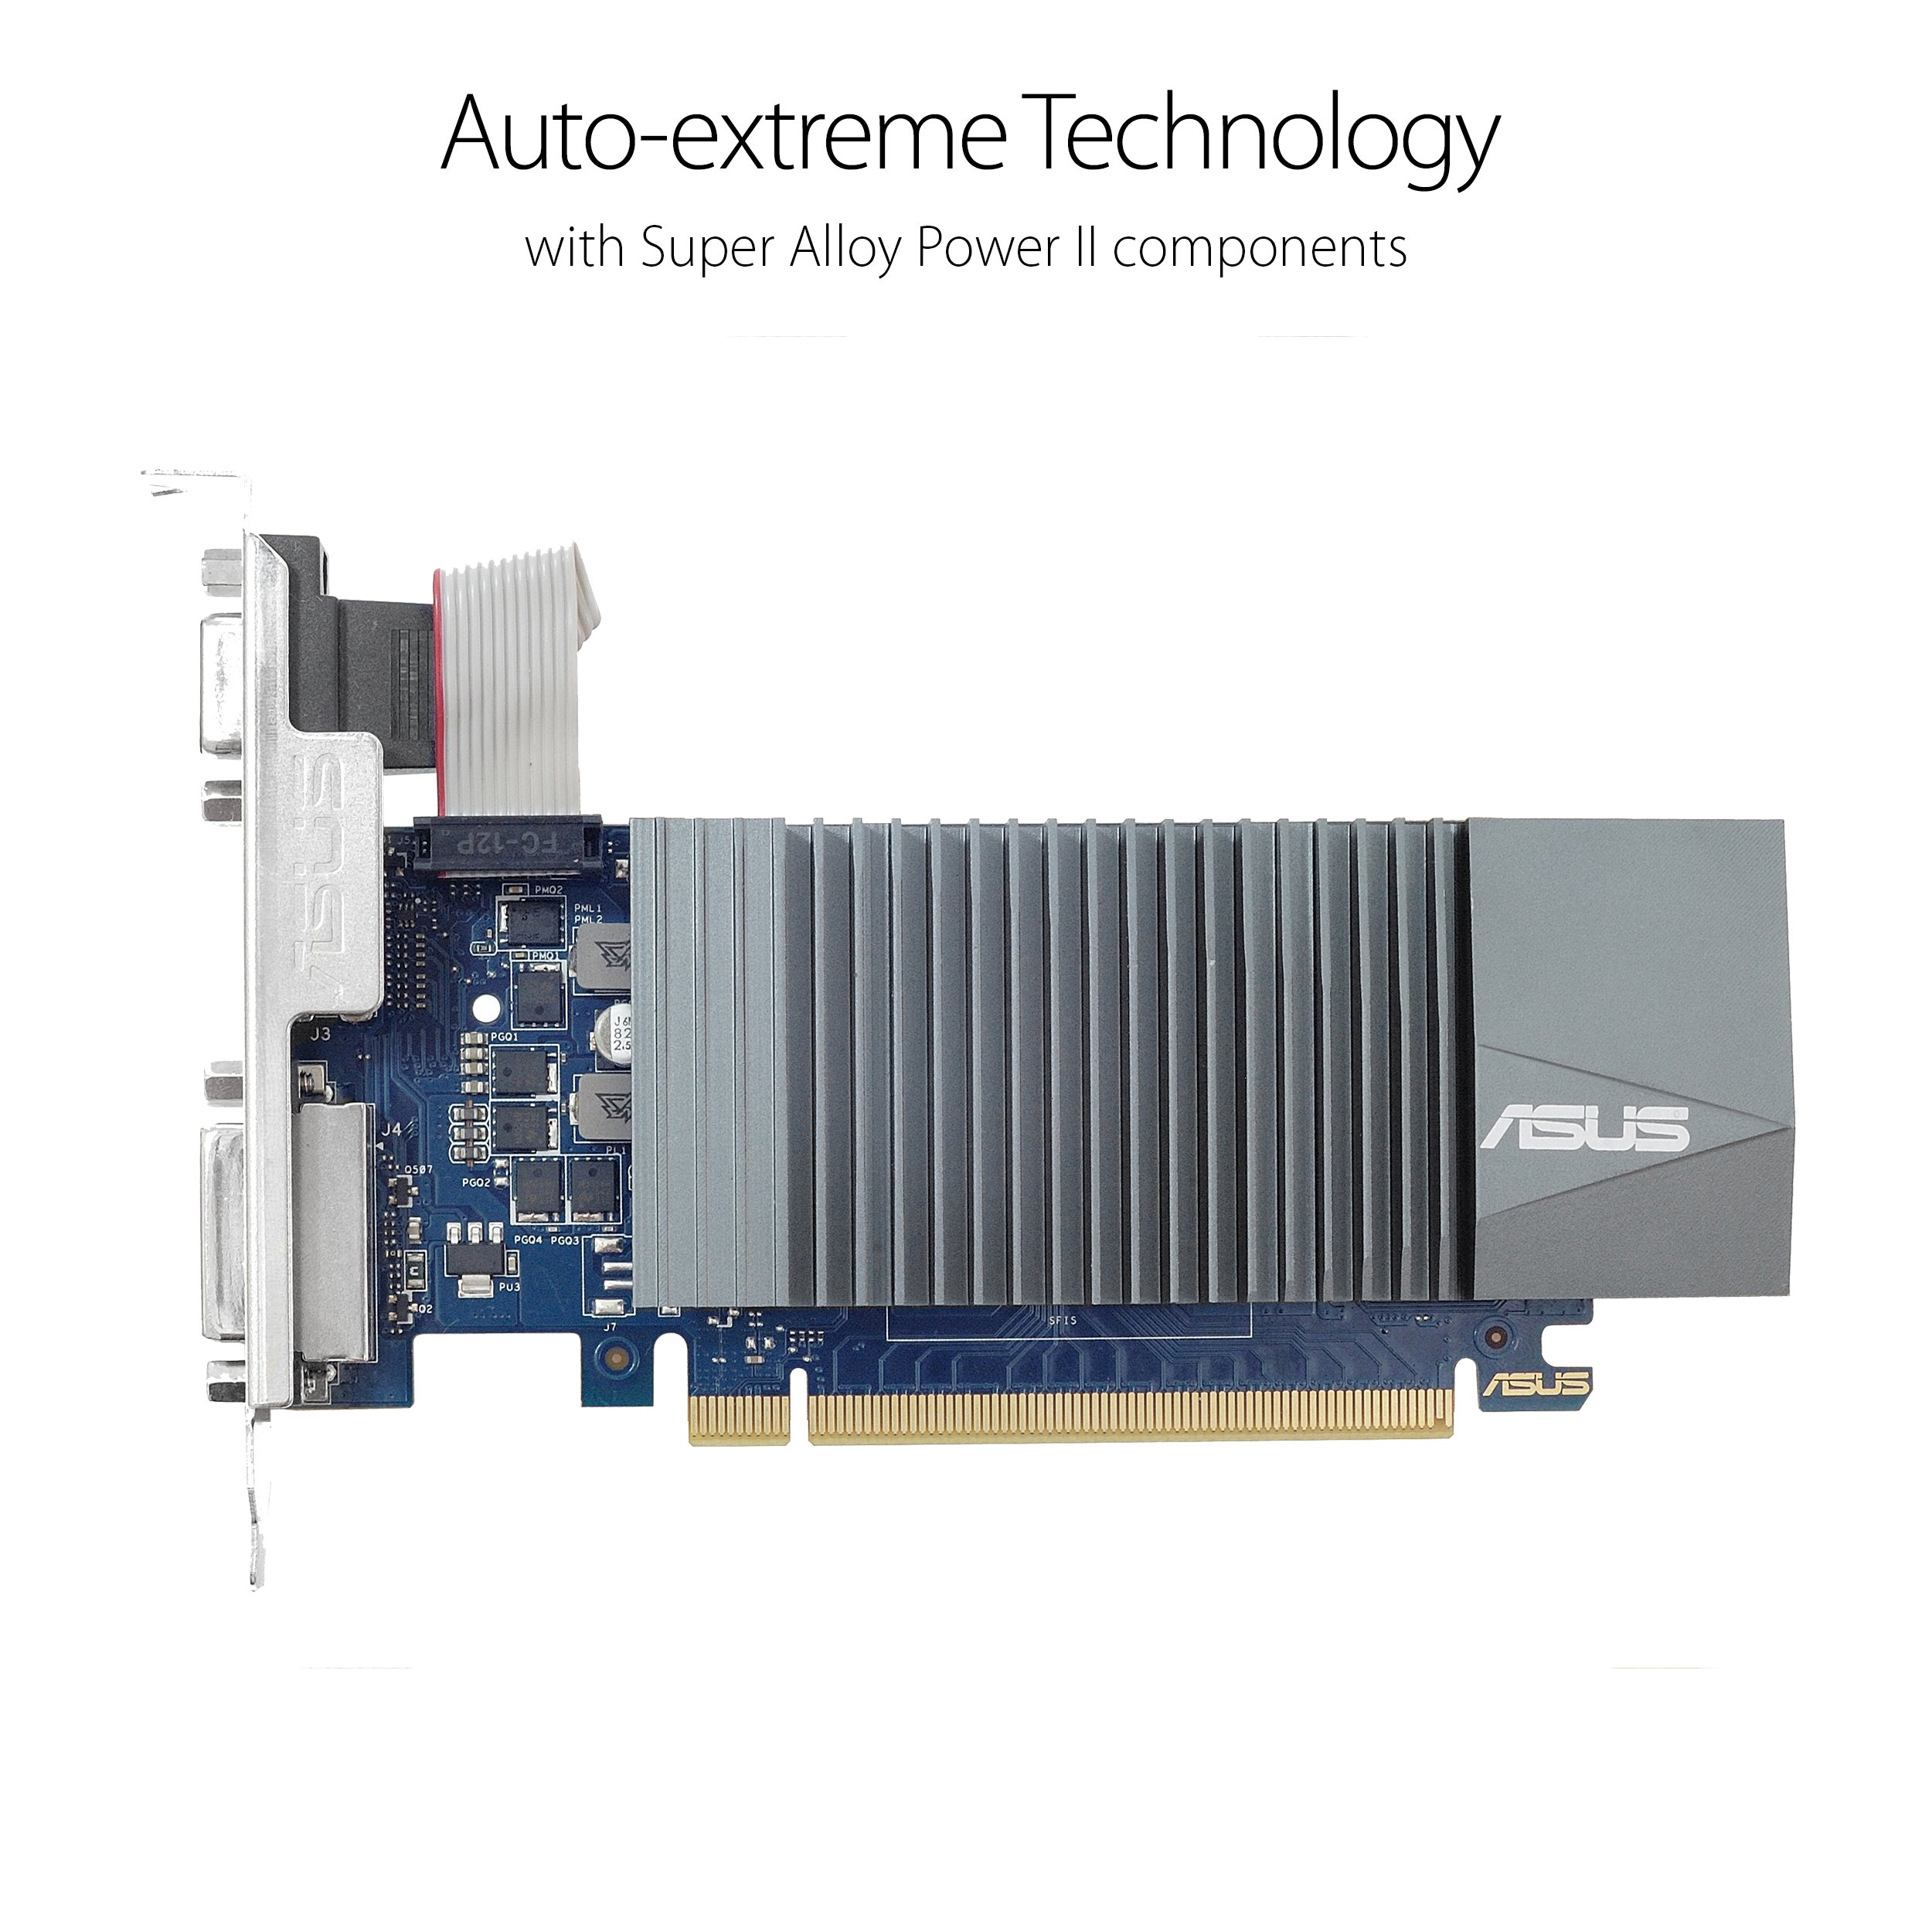 Asus GeForce GT 710 1GB GDDR5 HDMI VGA DVI Graphics Card (GT710-SL-1GD5-BRK) GT 710 1GB DDR5 Low Profile GT 710